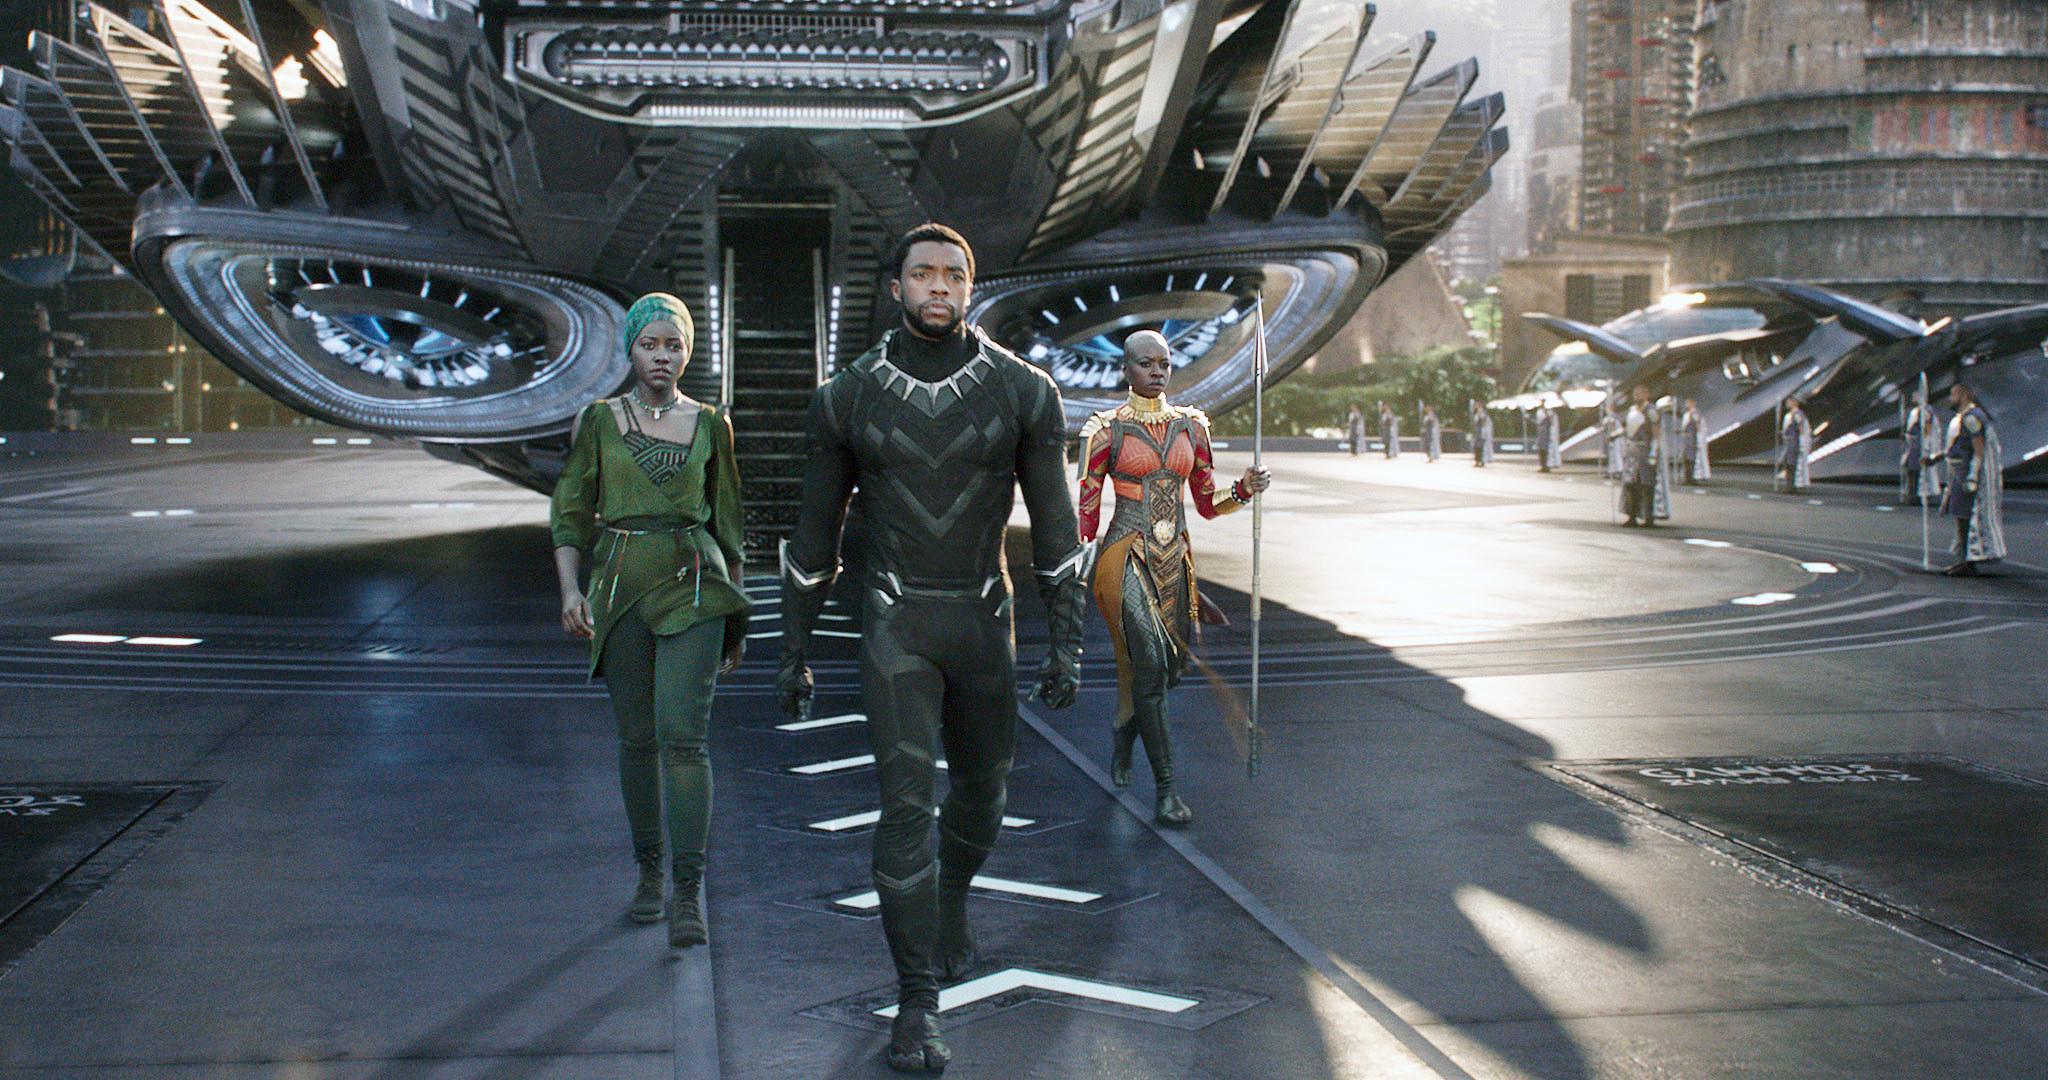 Lupita Nyong'o, Chadwick Boseman, Danai Gurira leaving an aircraft in Wakanda